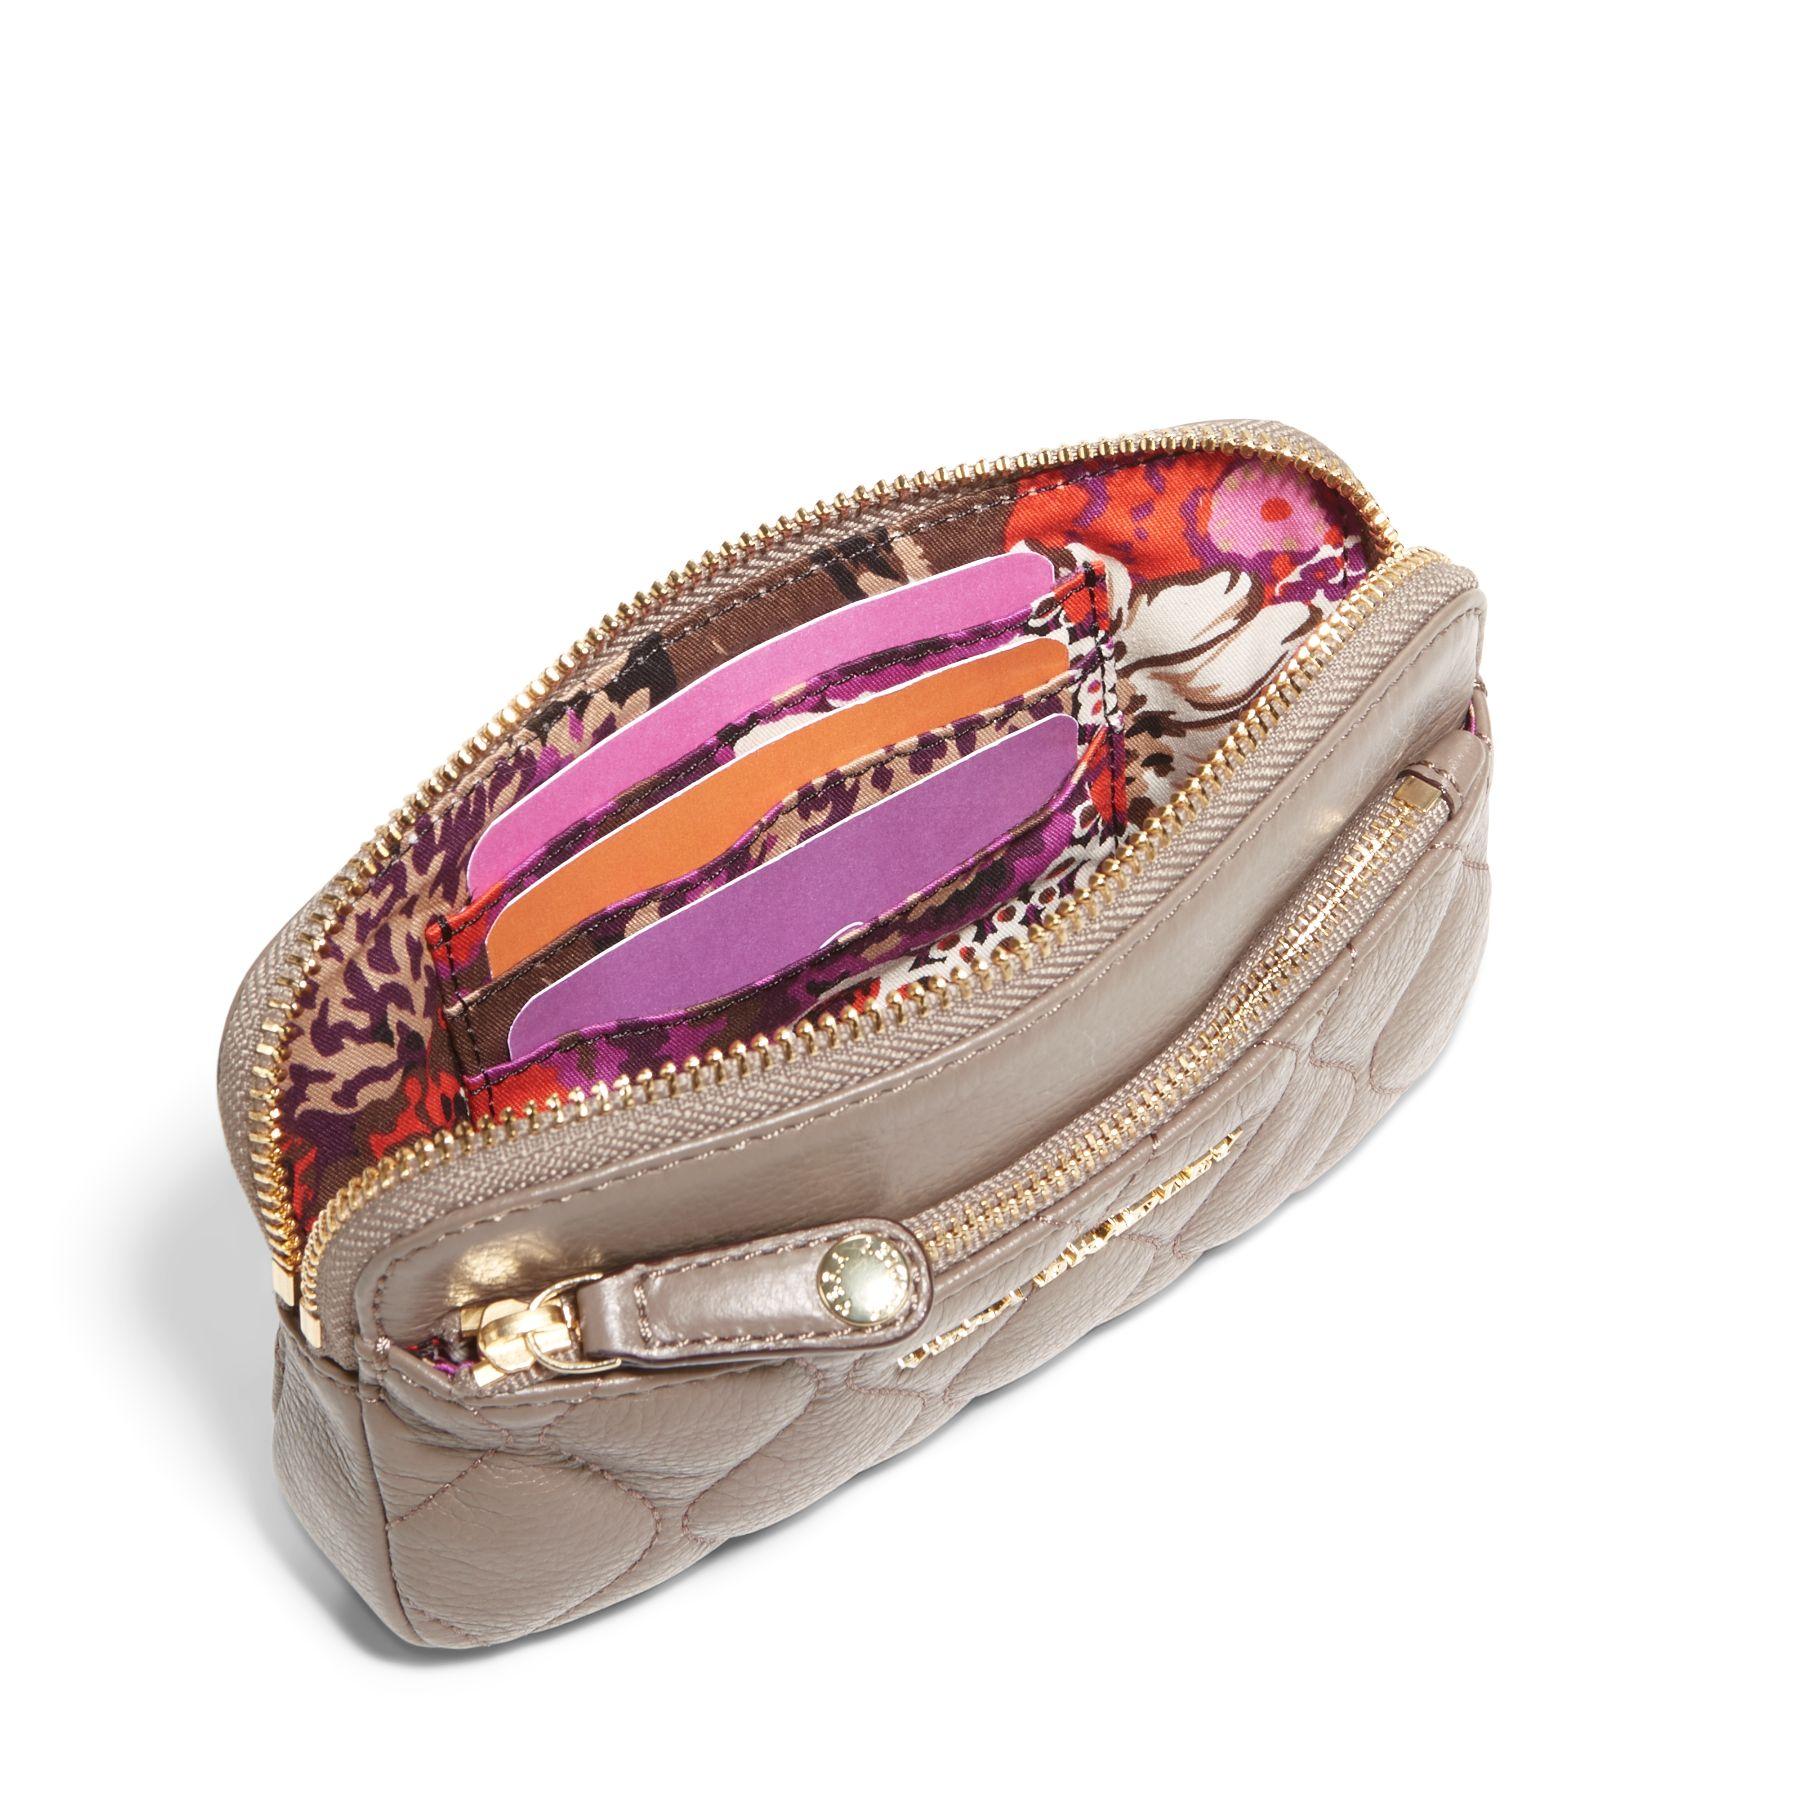 Vera Bradley Leather Quilted Sophie Wristlet Ebay